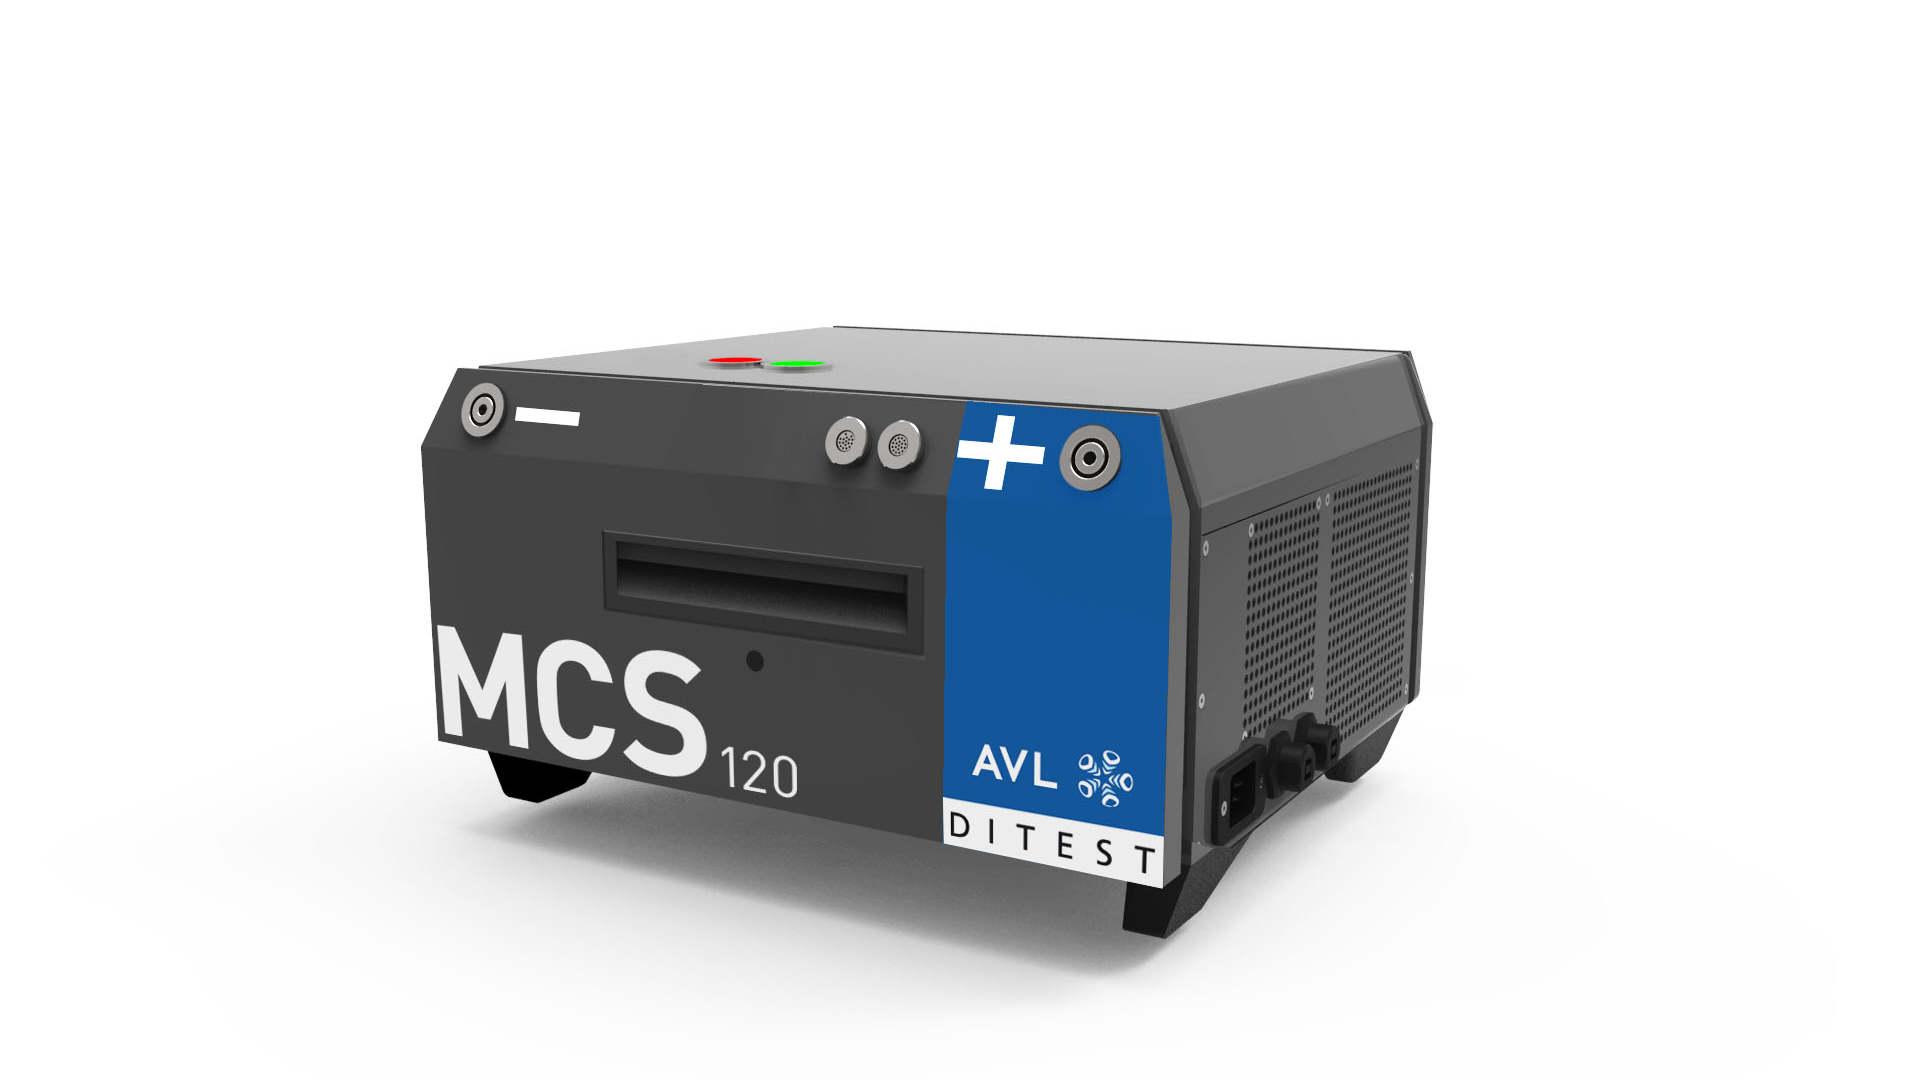 MCS120